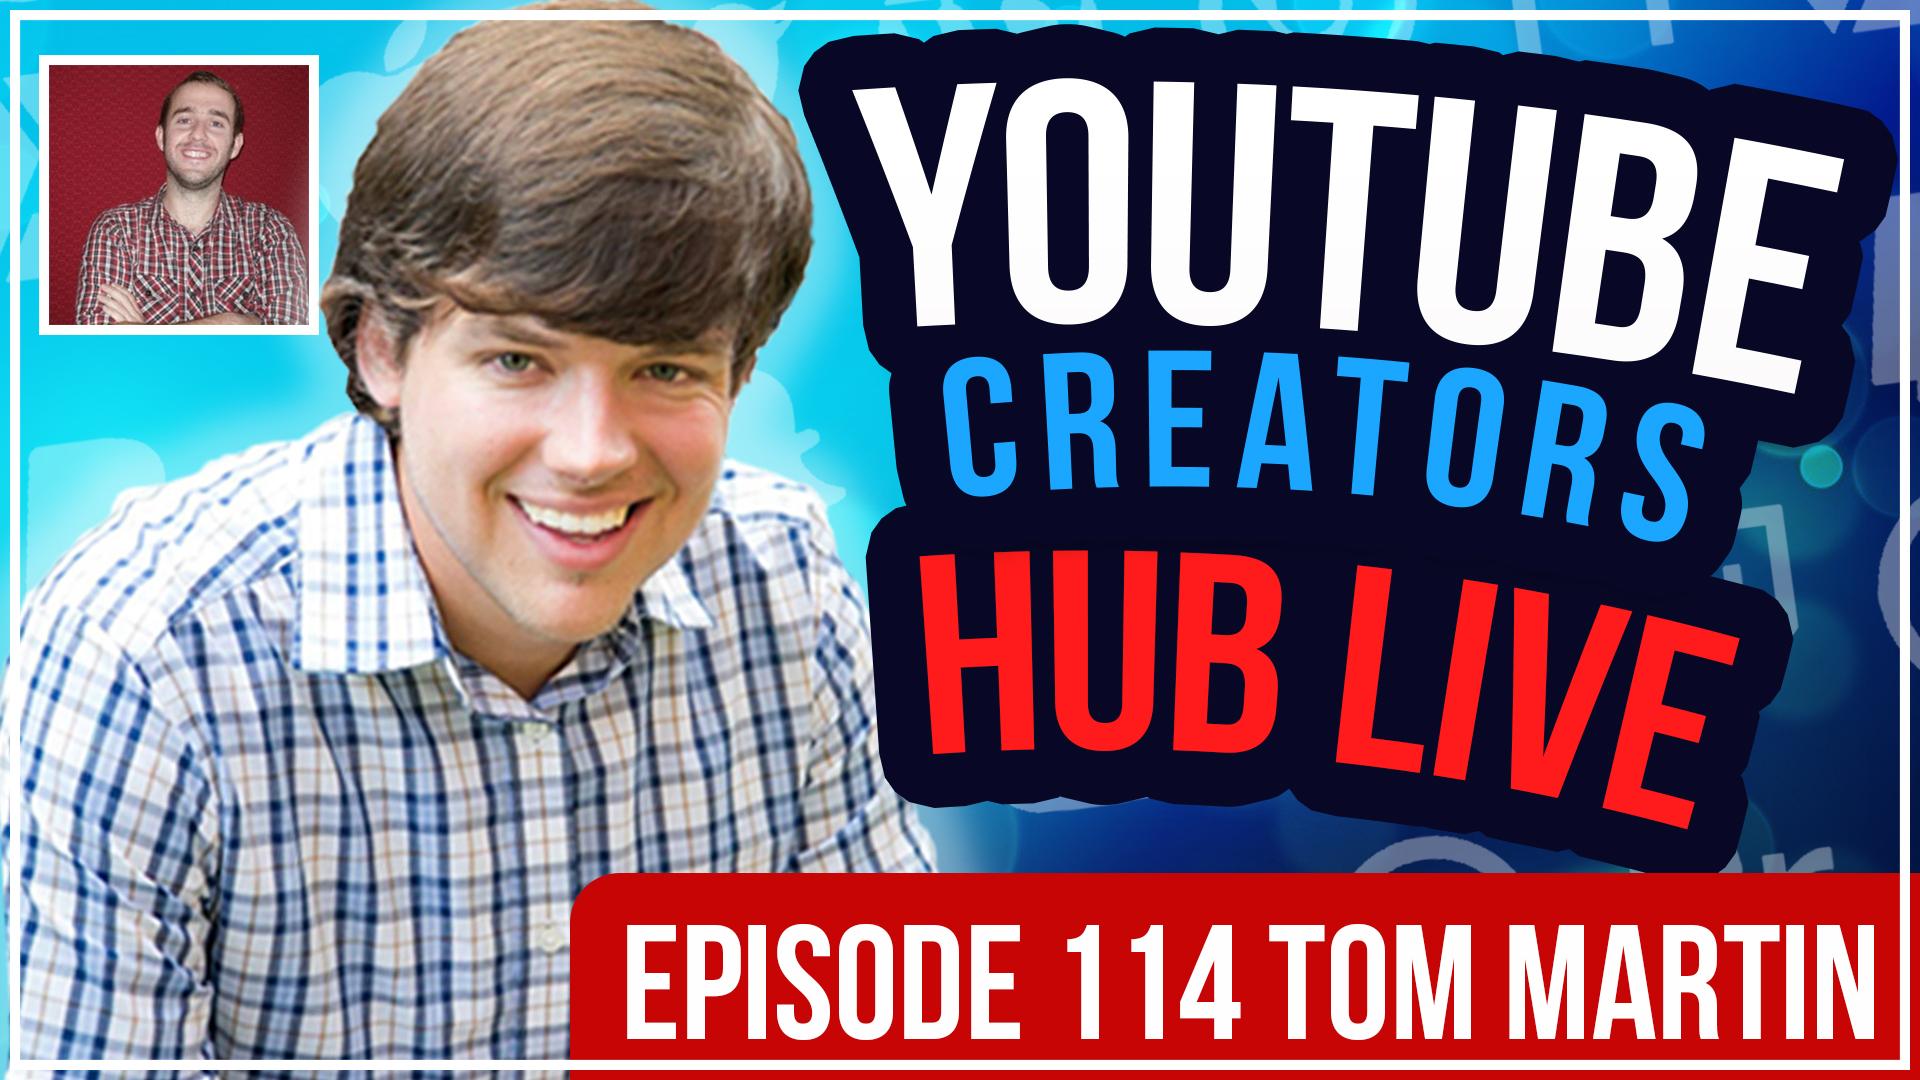 YouTube Creators Hub Live Episode 114